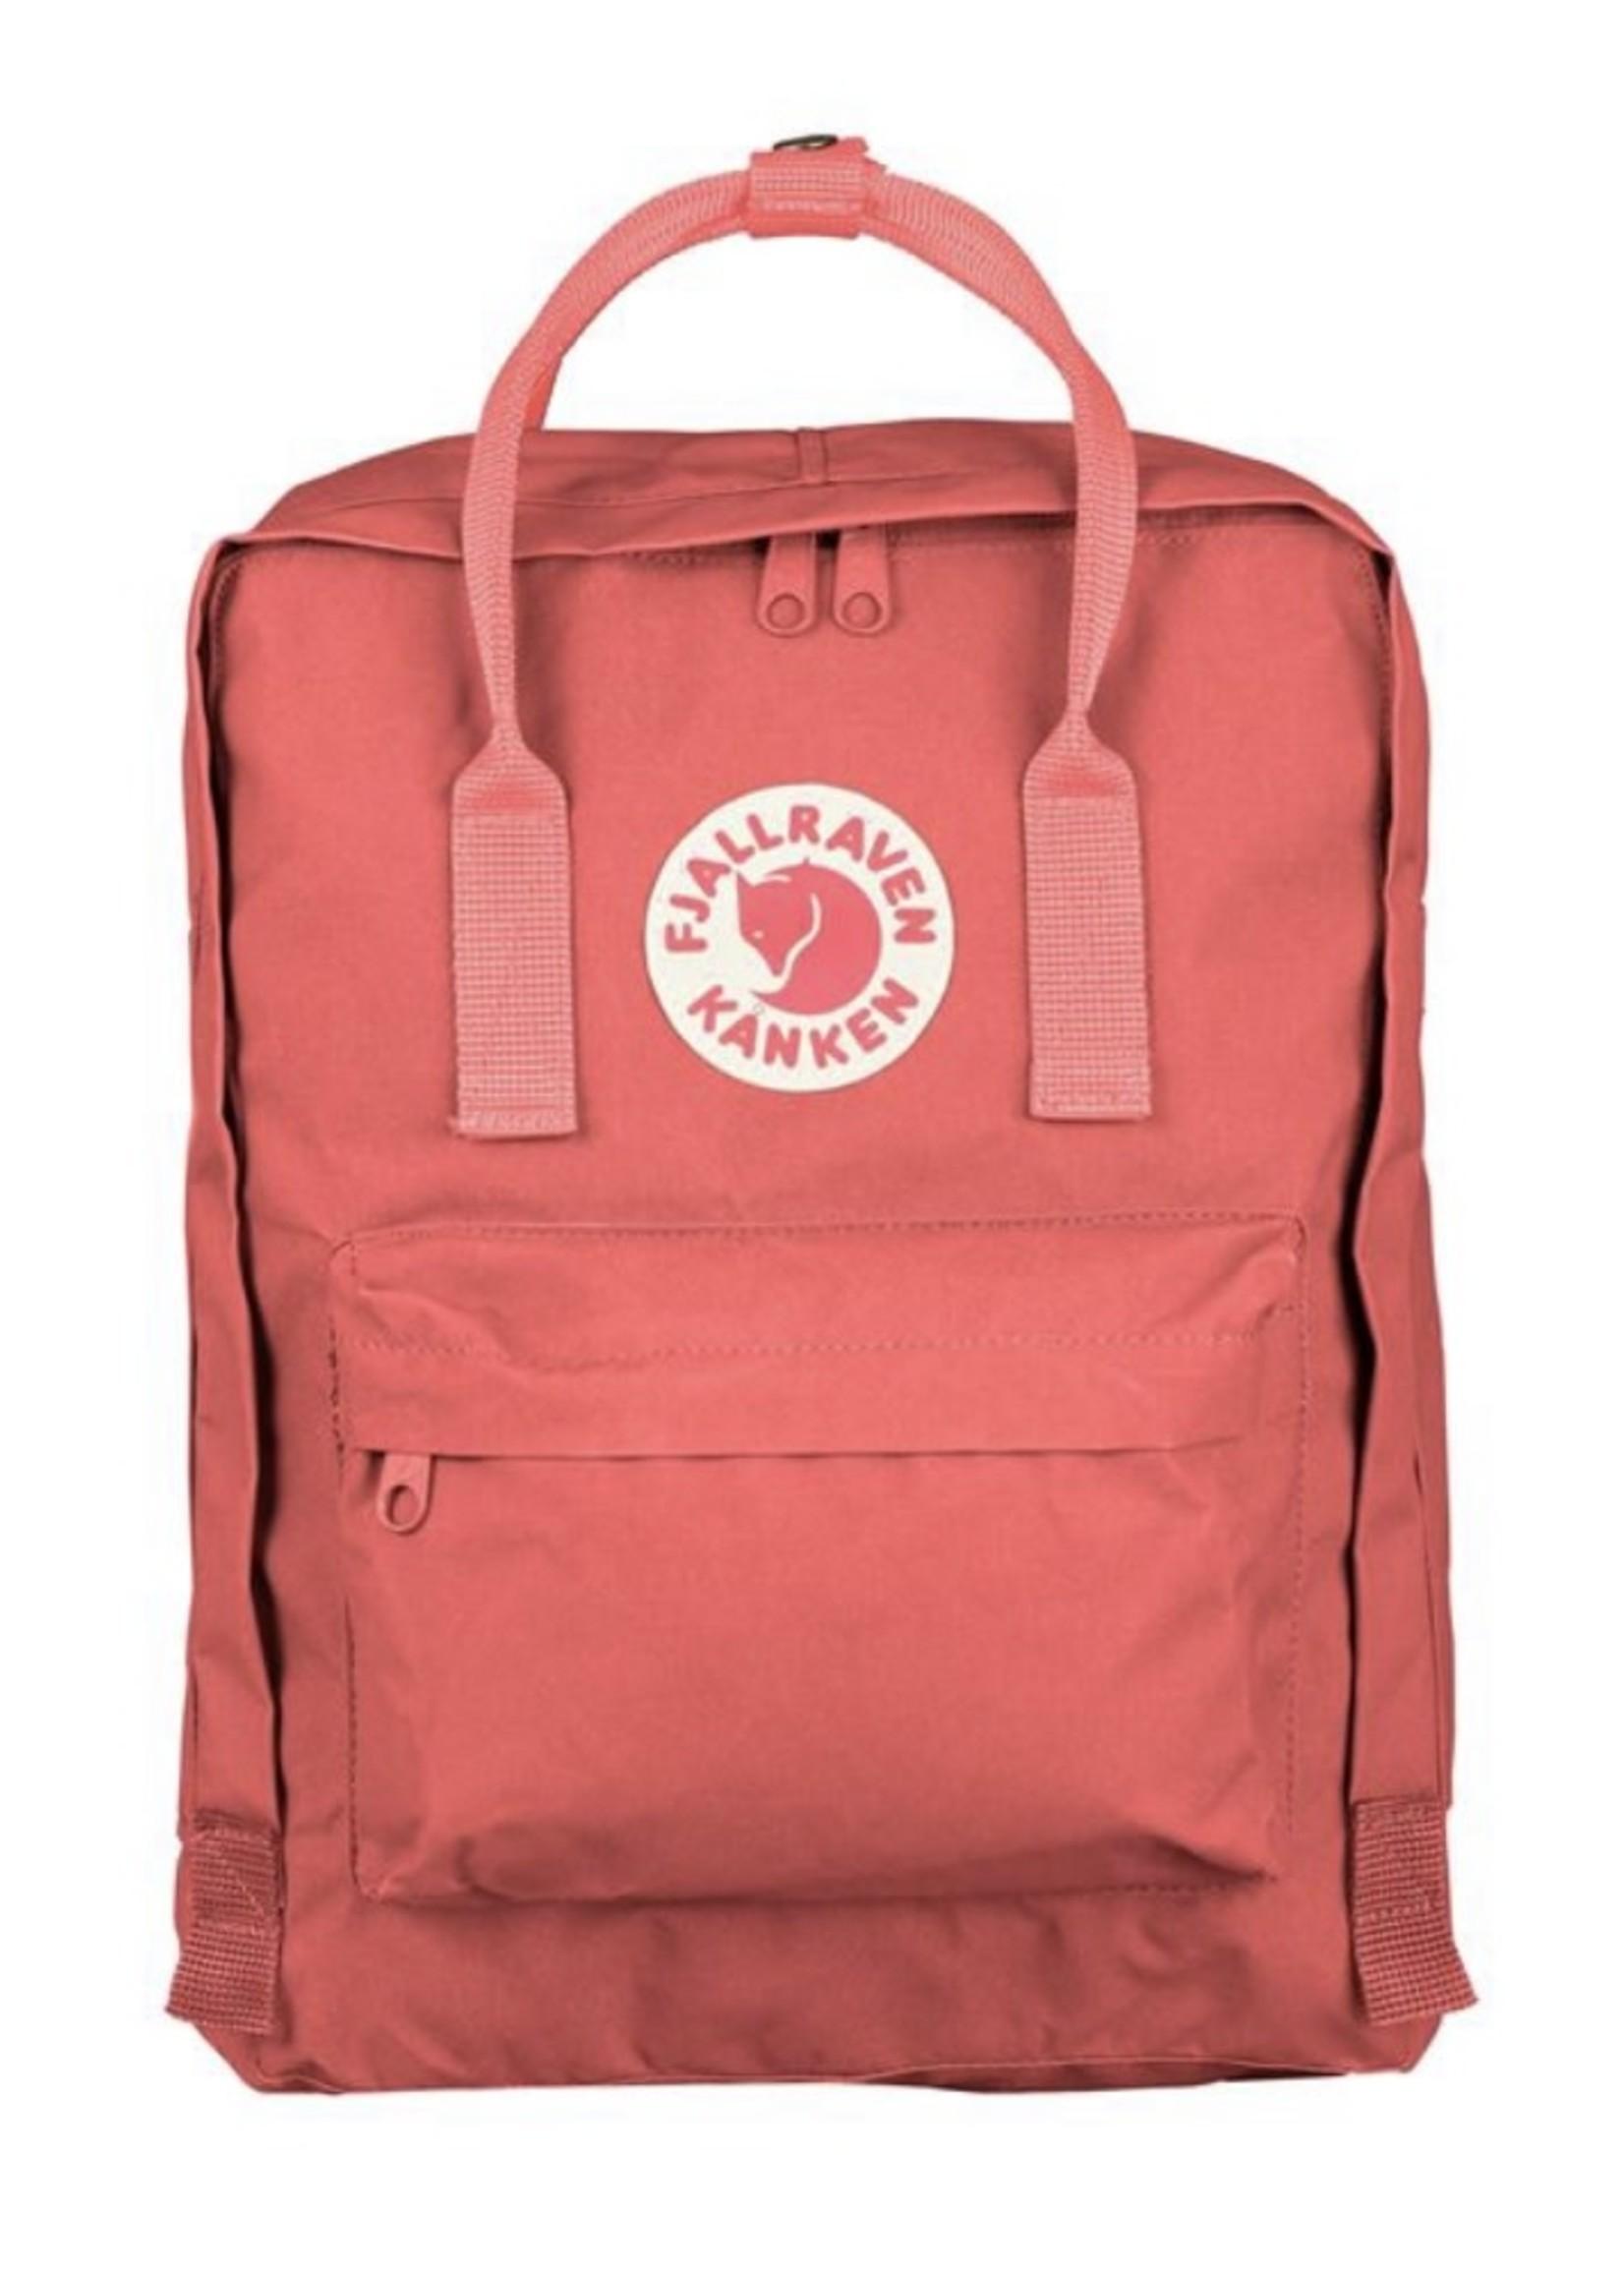 FJALL RAVEN Kanken Backpack PEACH PINK